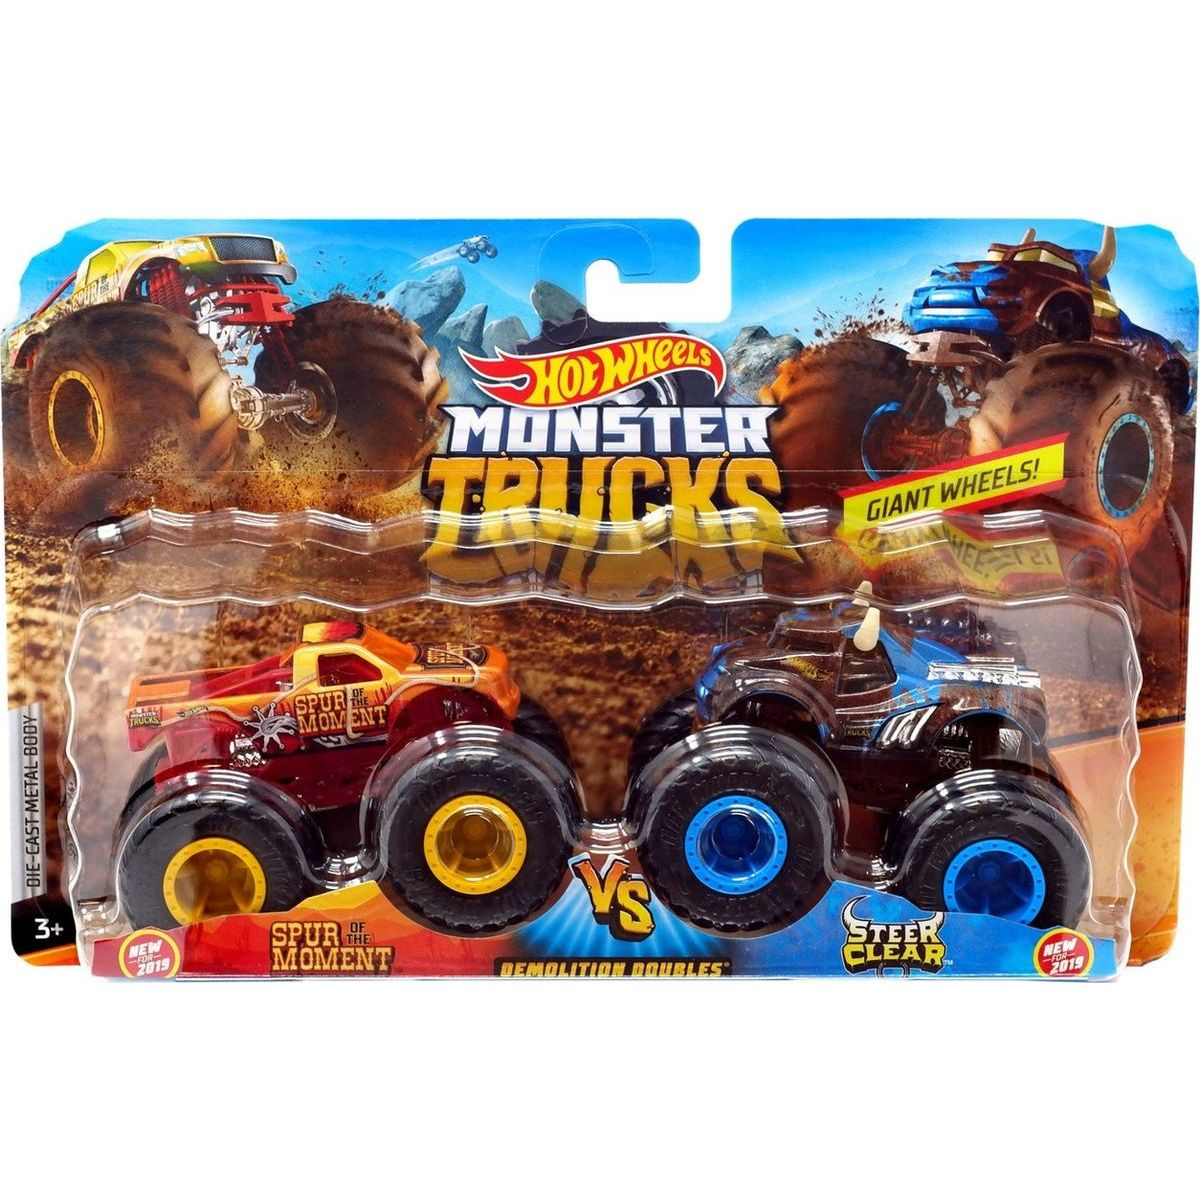 Mattel Hot Wheels Monster trucks demoliční duo Spur Moment VS Sterr Clear